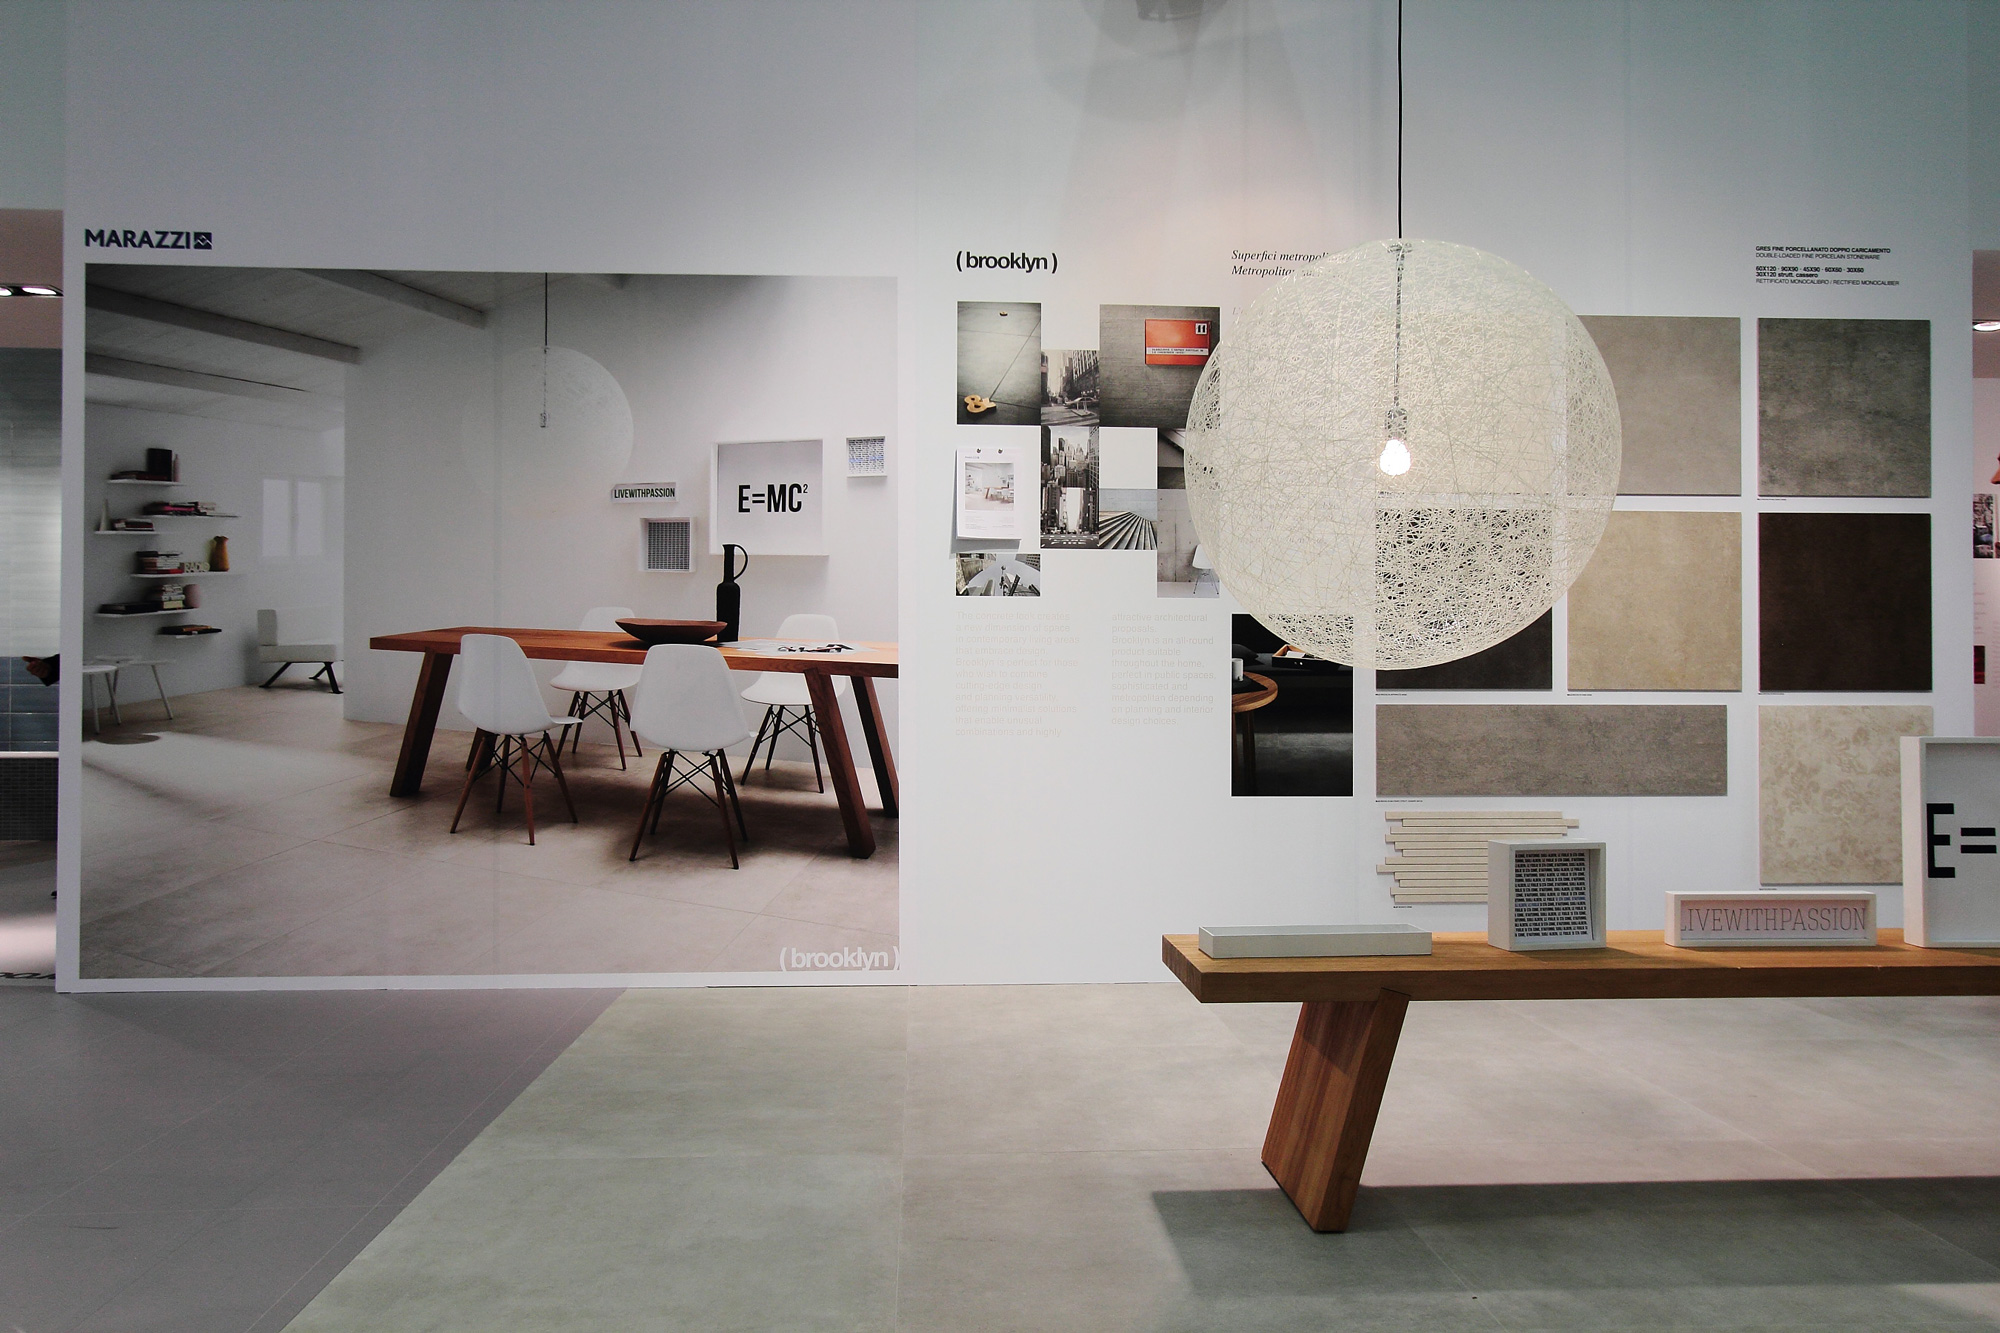 cersaie 2012 for marazzi group uainot. Black Bedroom Furniture Sets. Home Design Ideas